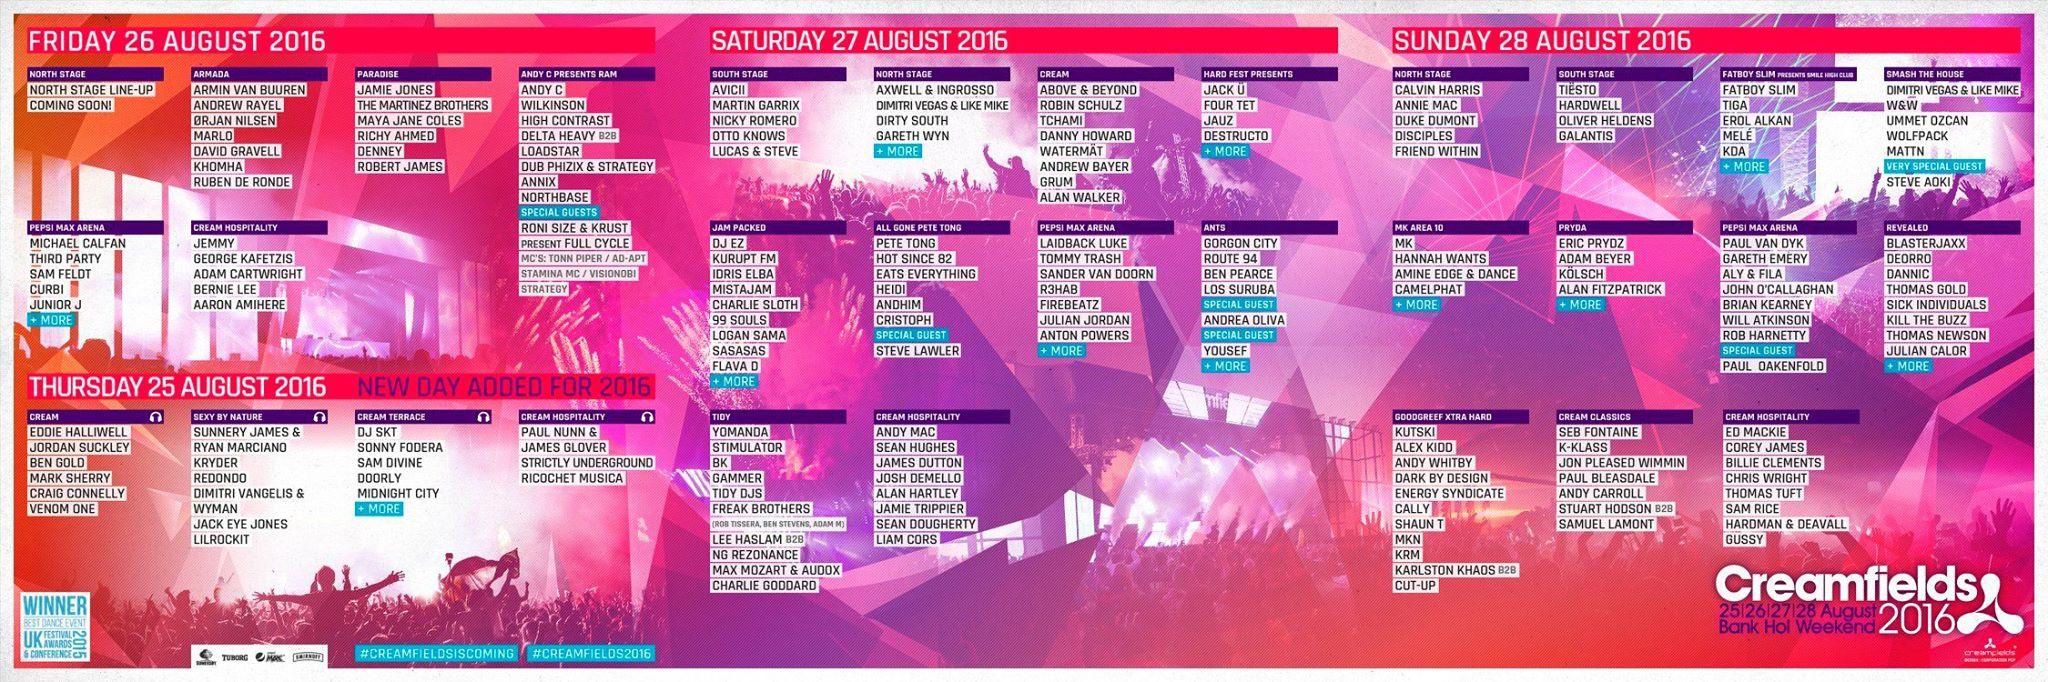 Creamfields 2016 line up